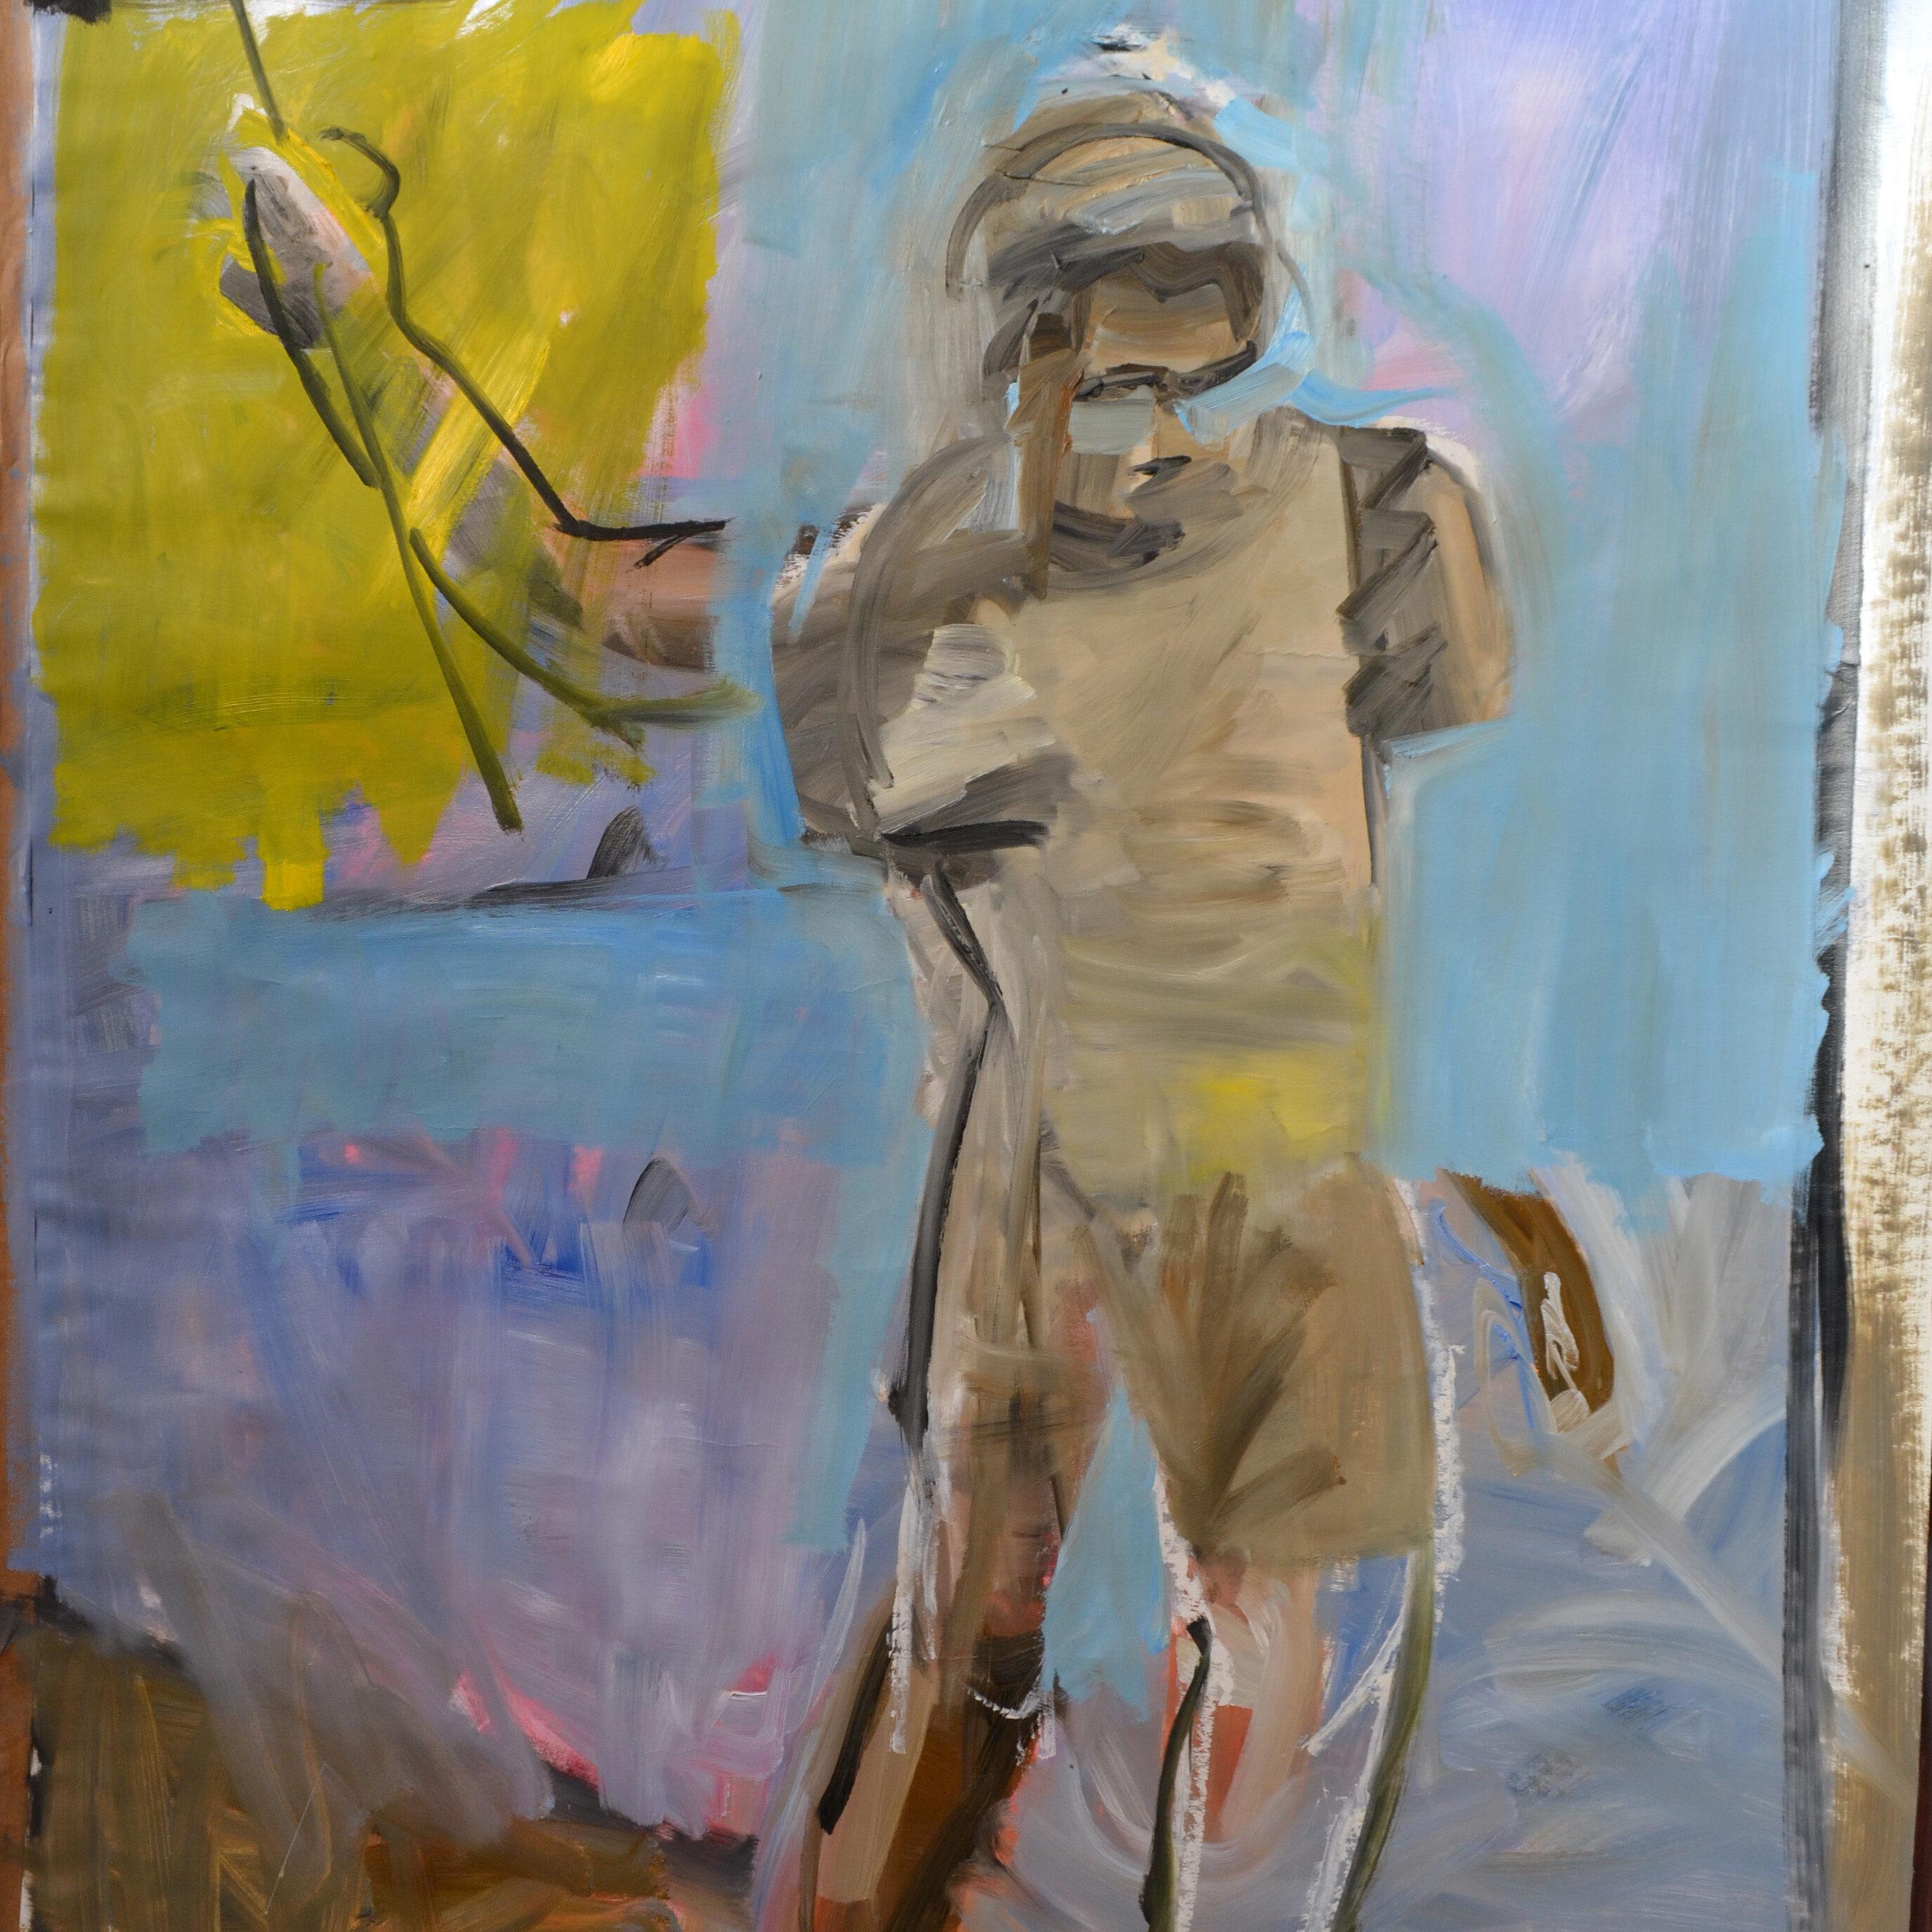 Male 3, 2016, 140 x 80 cm, oil on paper.